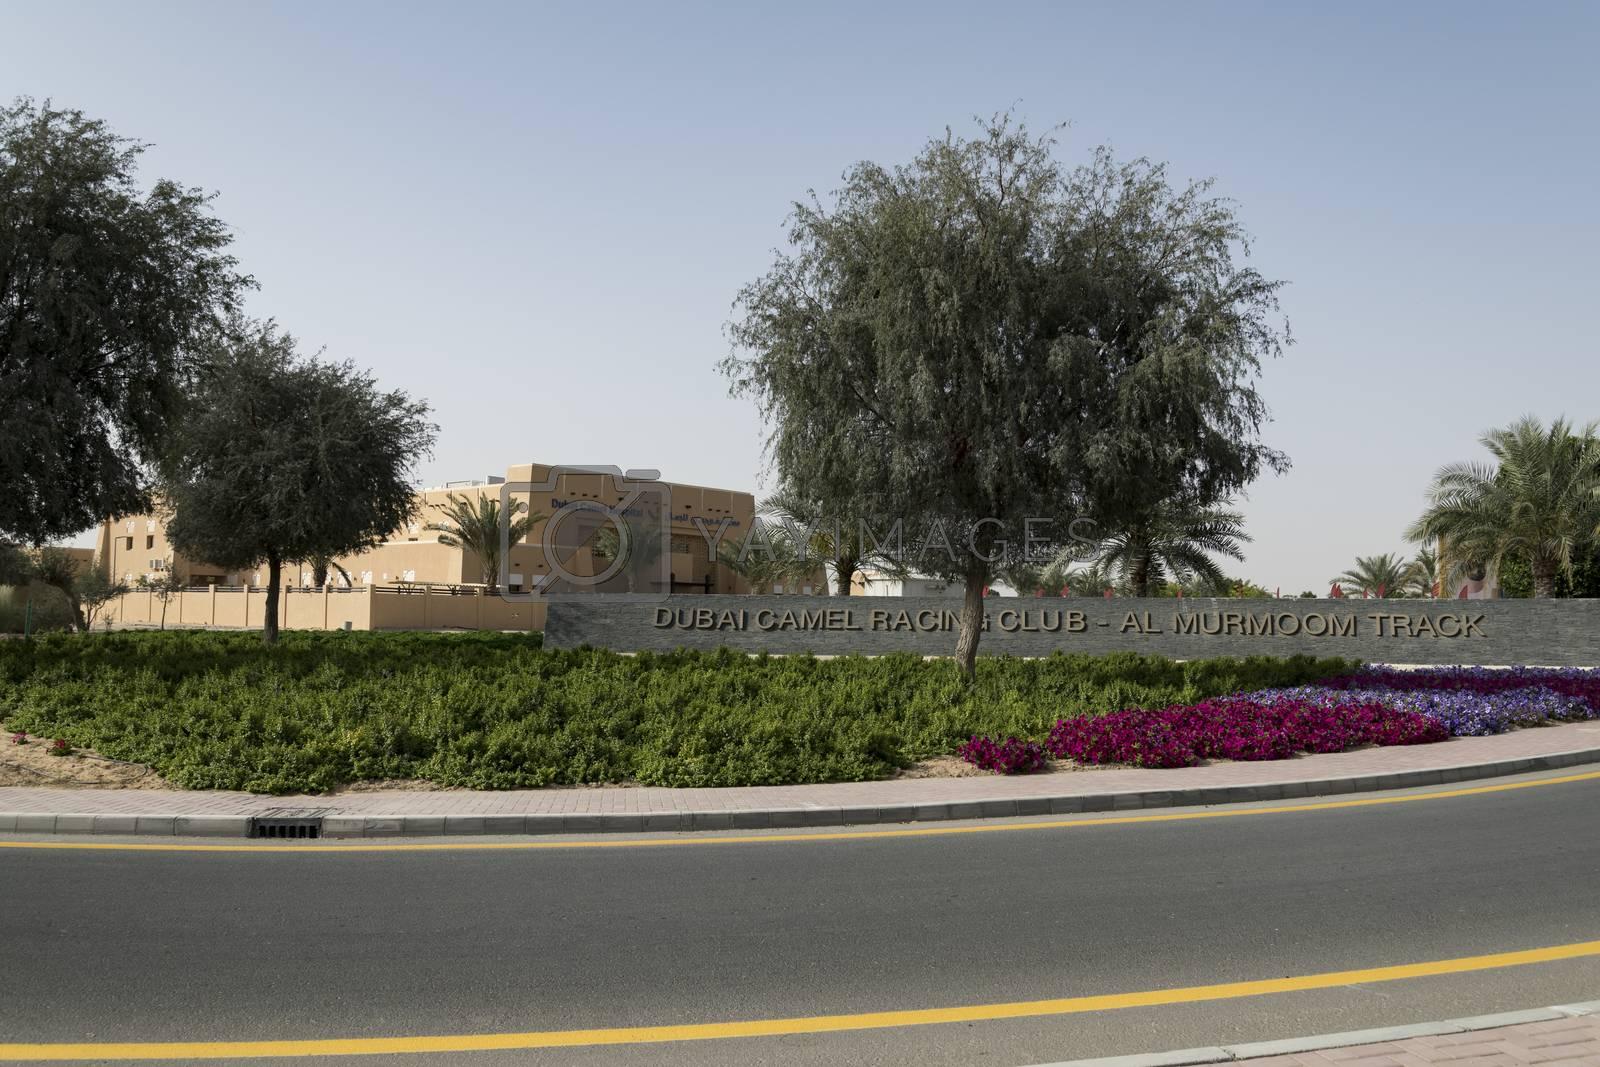 Dubai, United Arab Emirates,  6 April 2018. Main entrance of Al Murmoom Camel Racing Club.